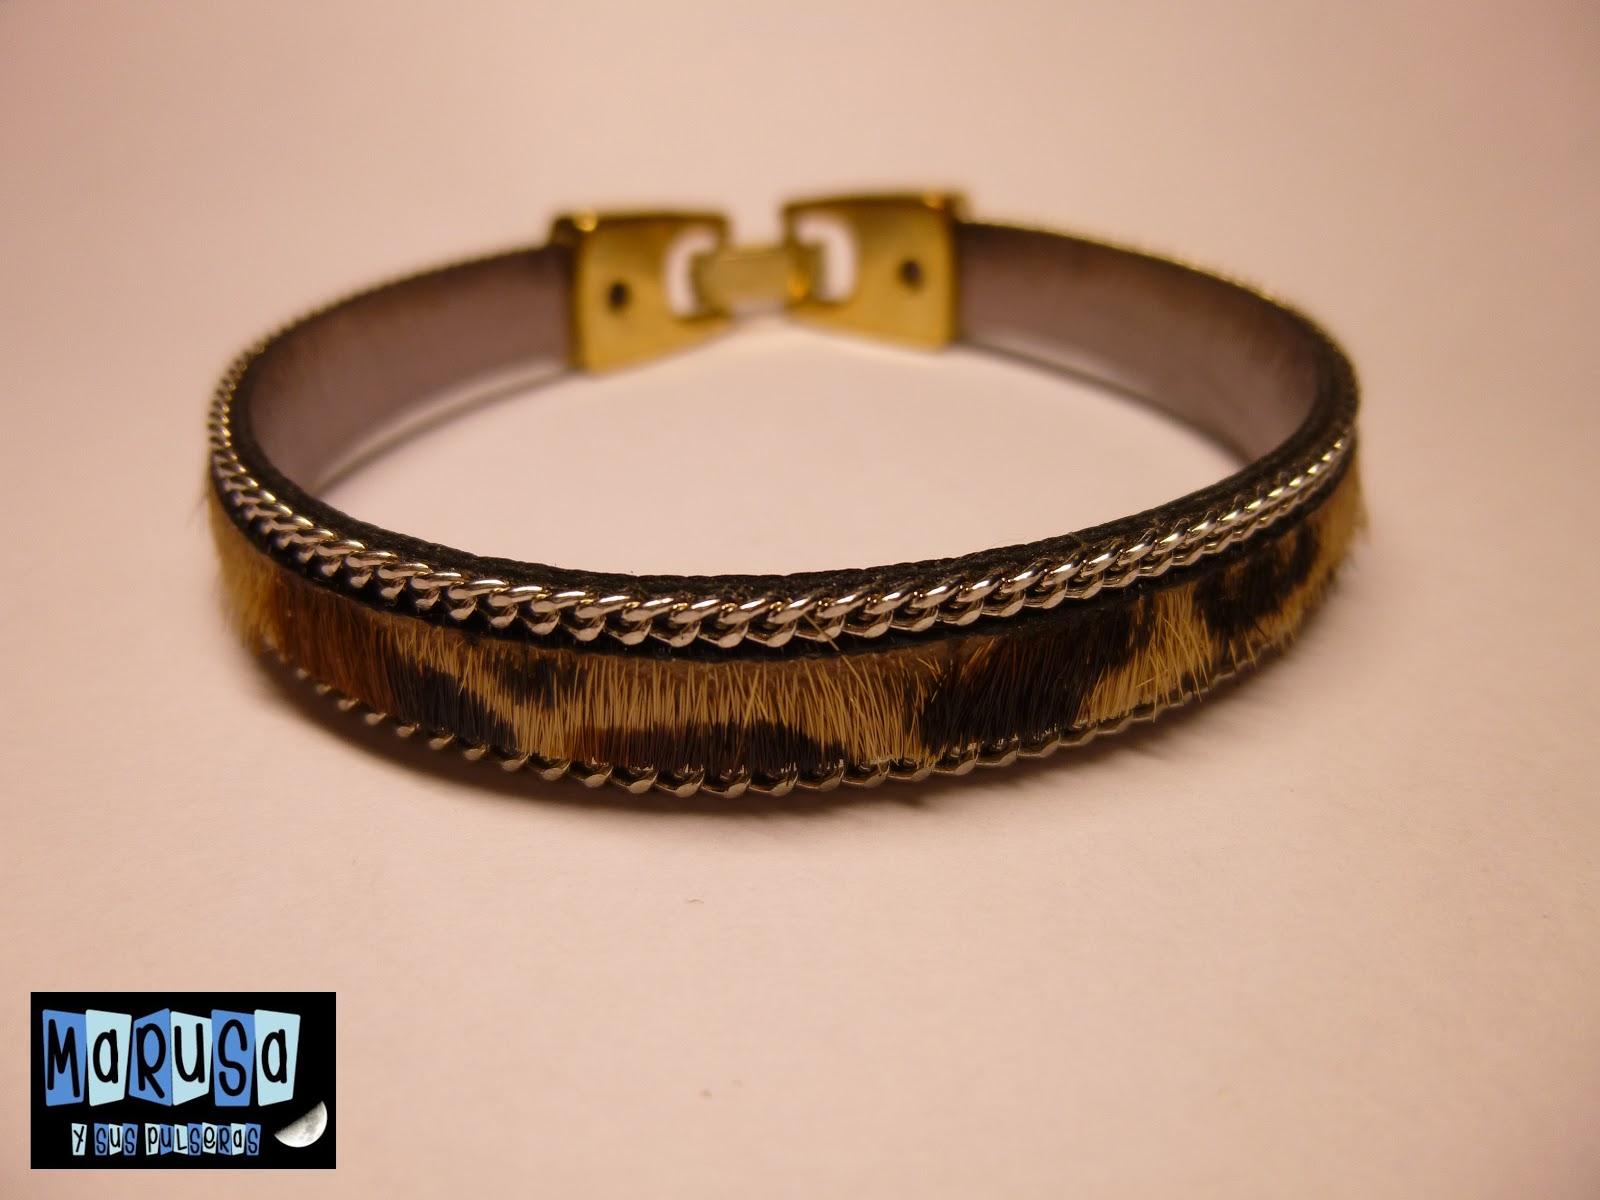 pulsera piel marusa potro bonita original barata € regalo reyes madre novia